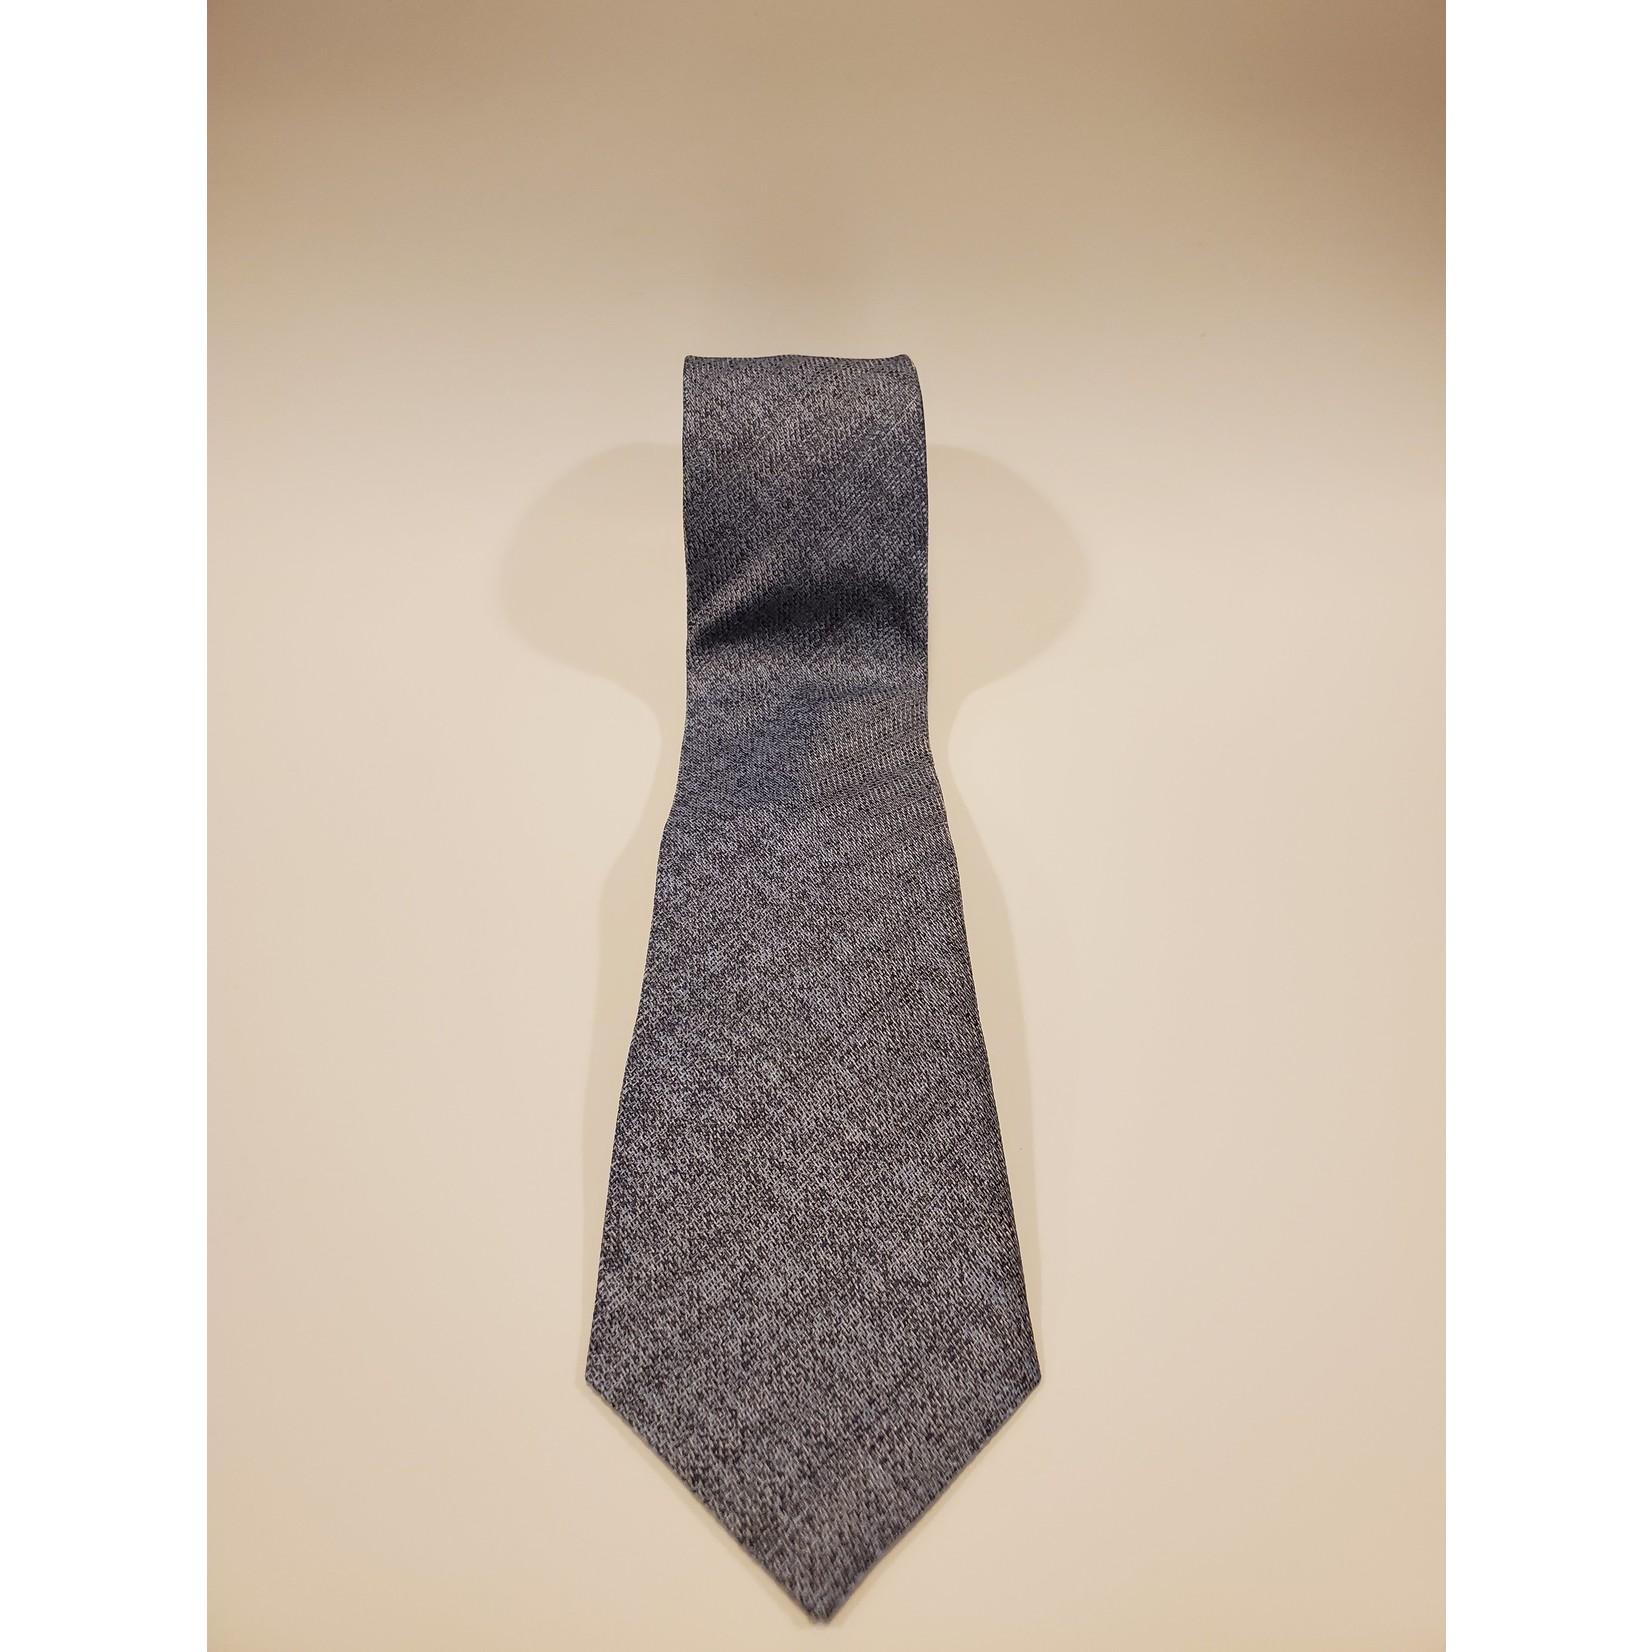 TailoRed TalioRed 212601 Jacquard Silk Tie